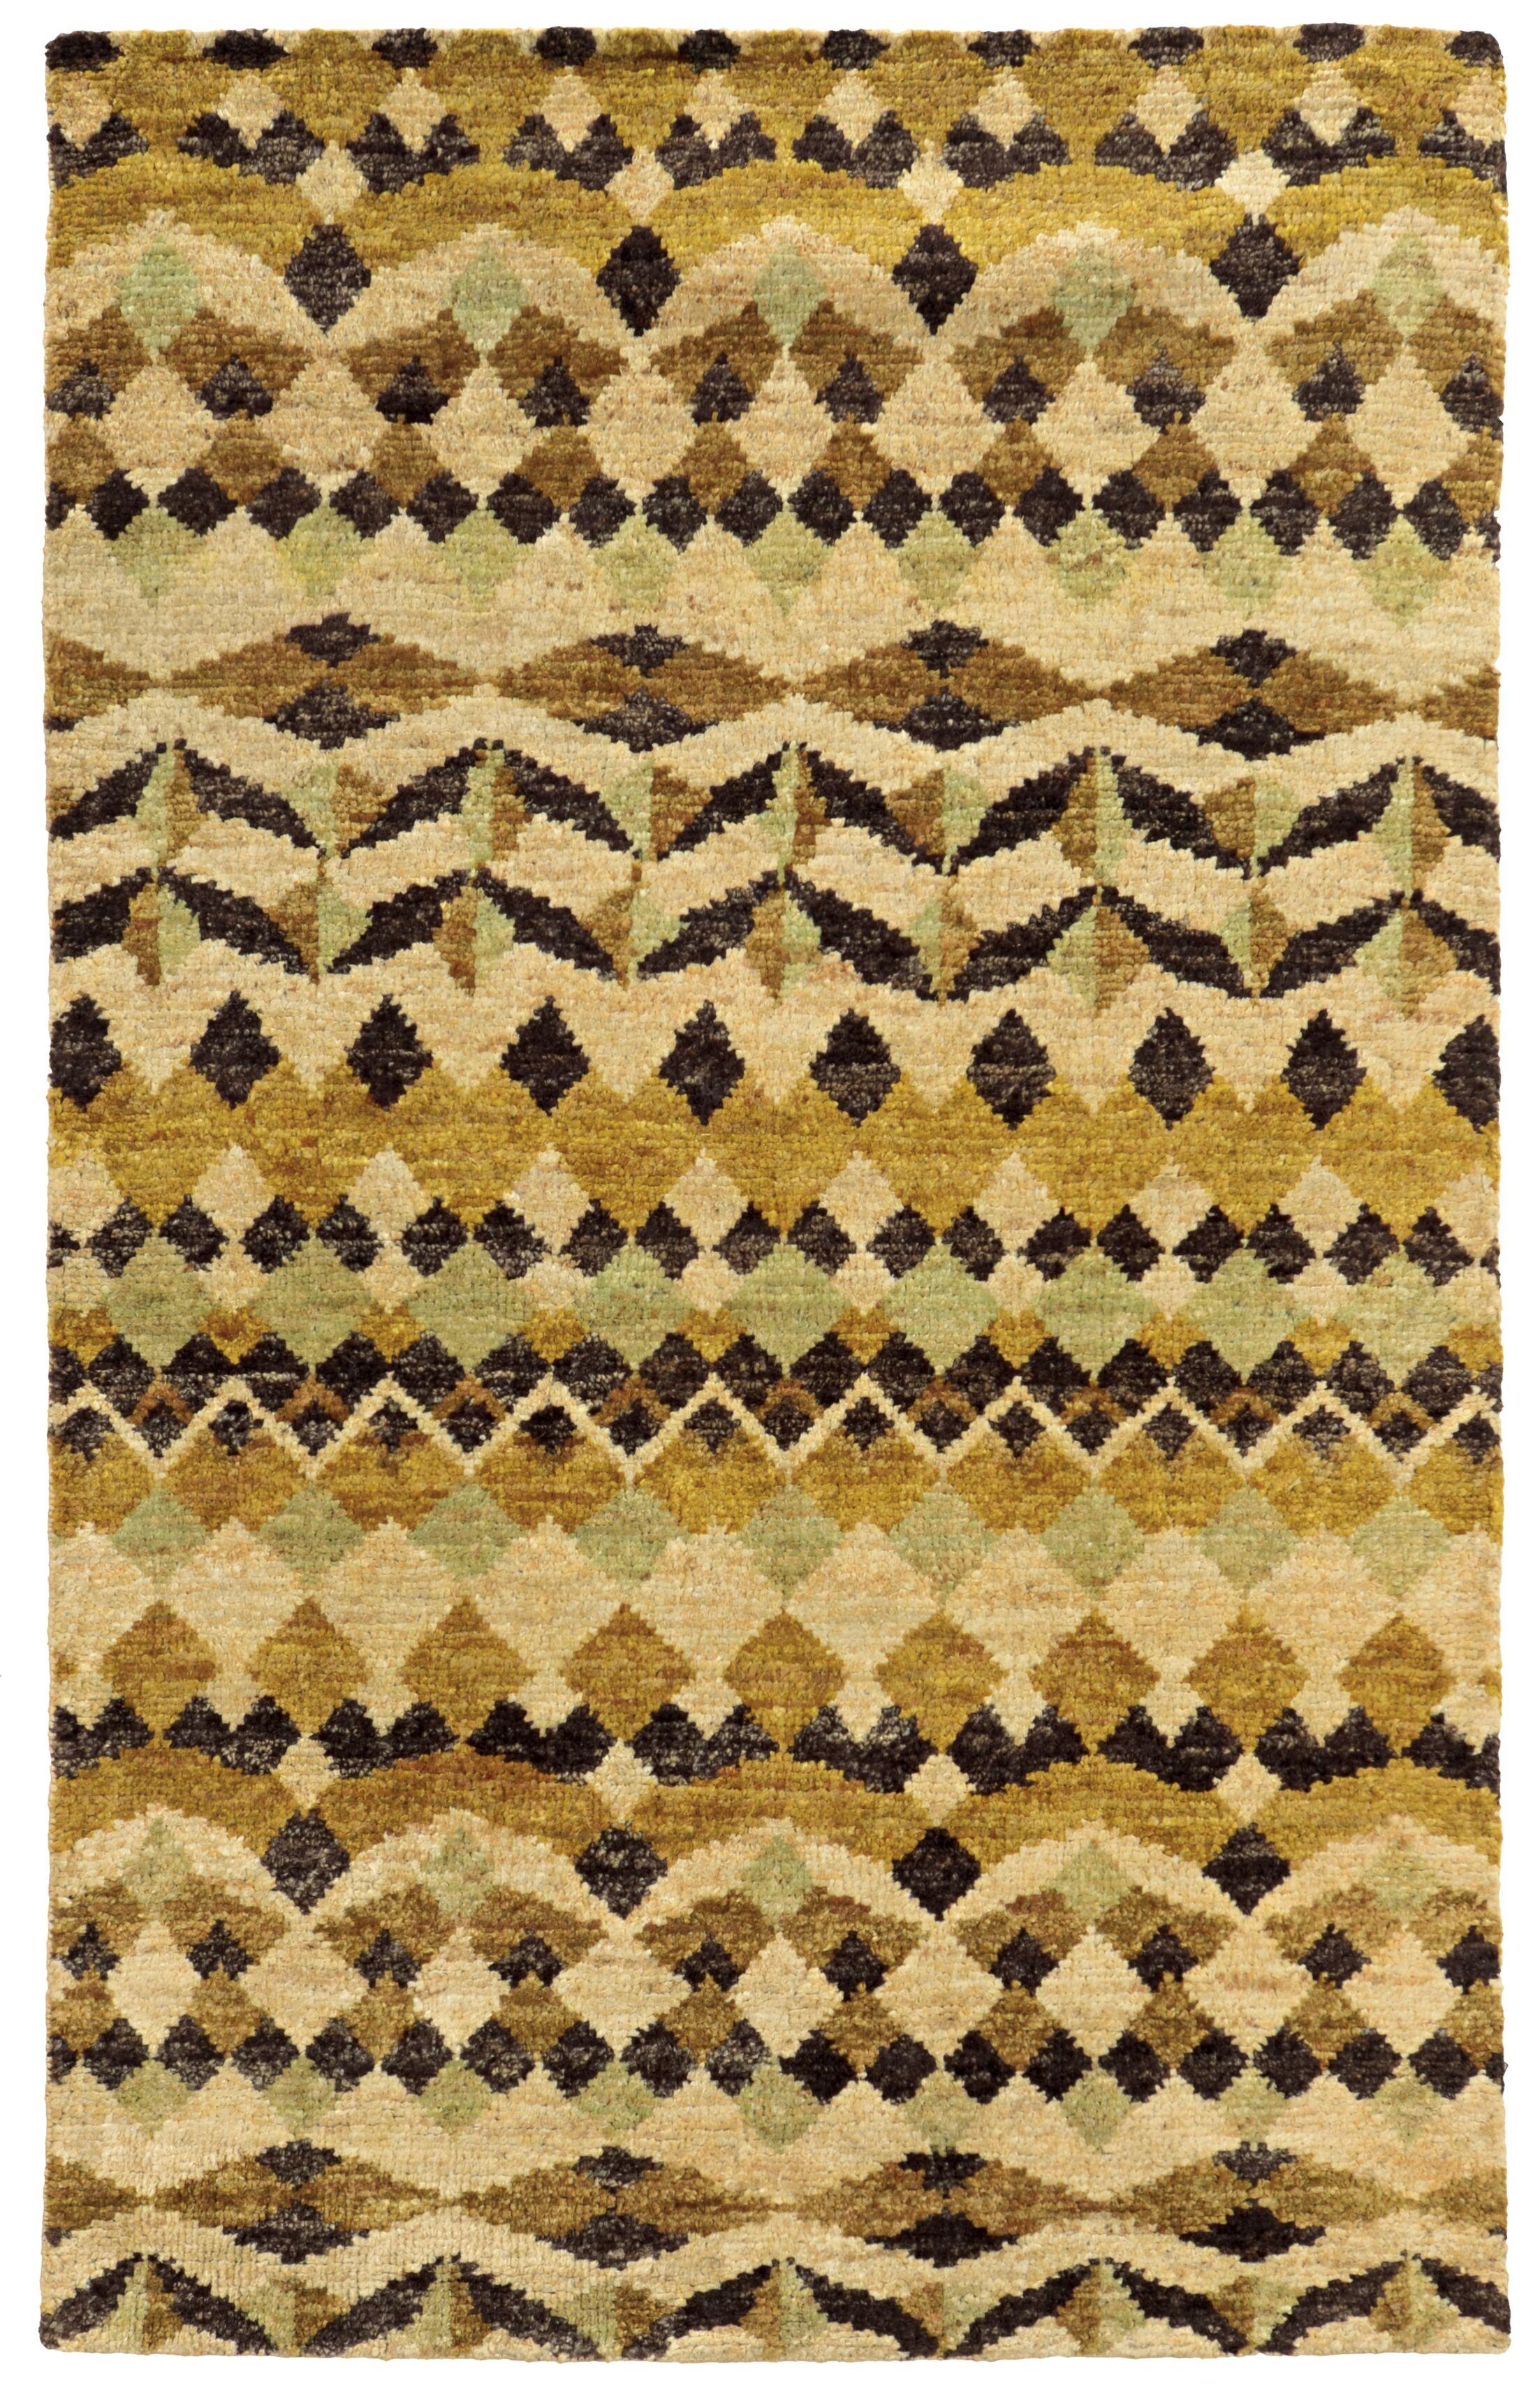 Tommy Bahama Ansley Beige / Gold Geometric Rug Rug Size: Rectangle 10' x 13'